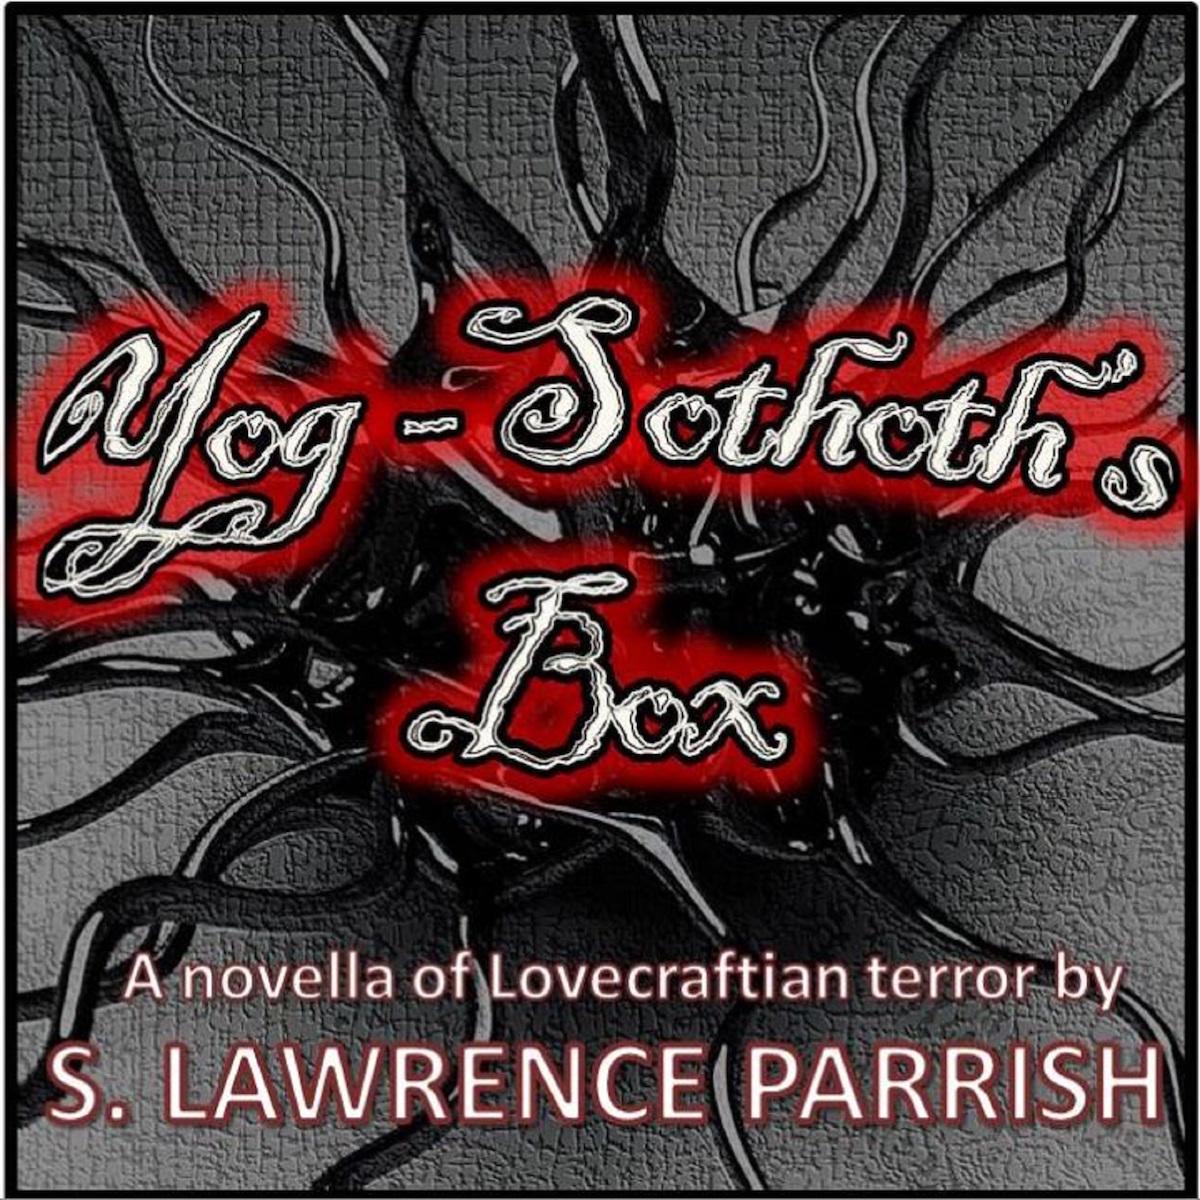 Yog-Sothoth's Box